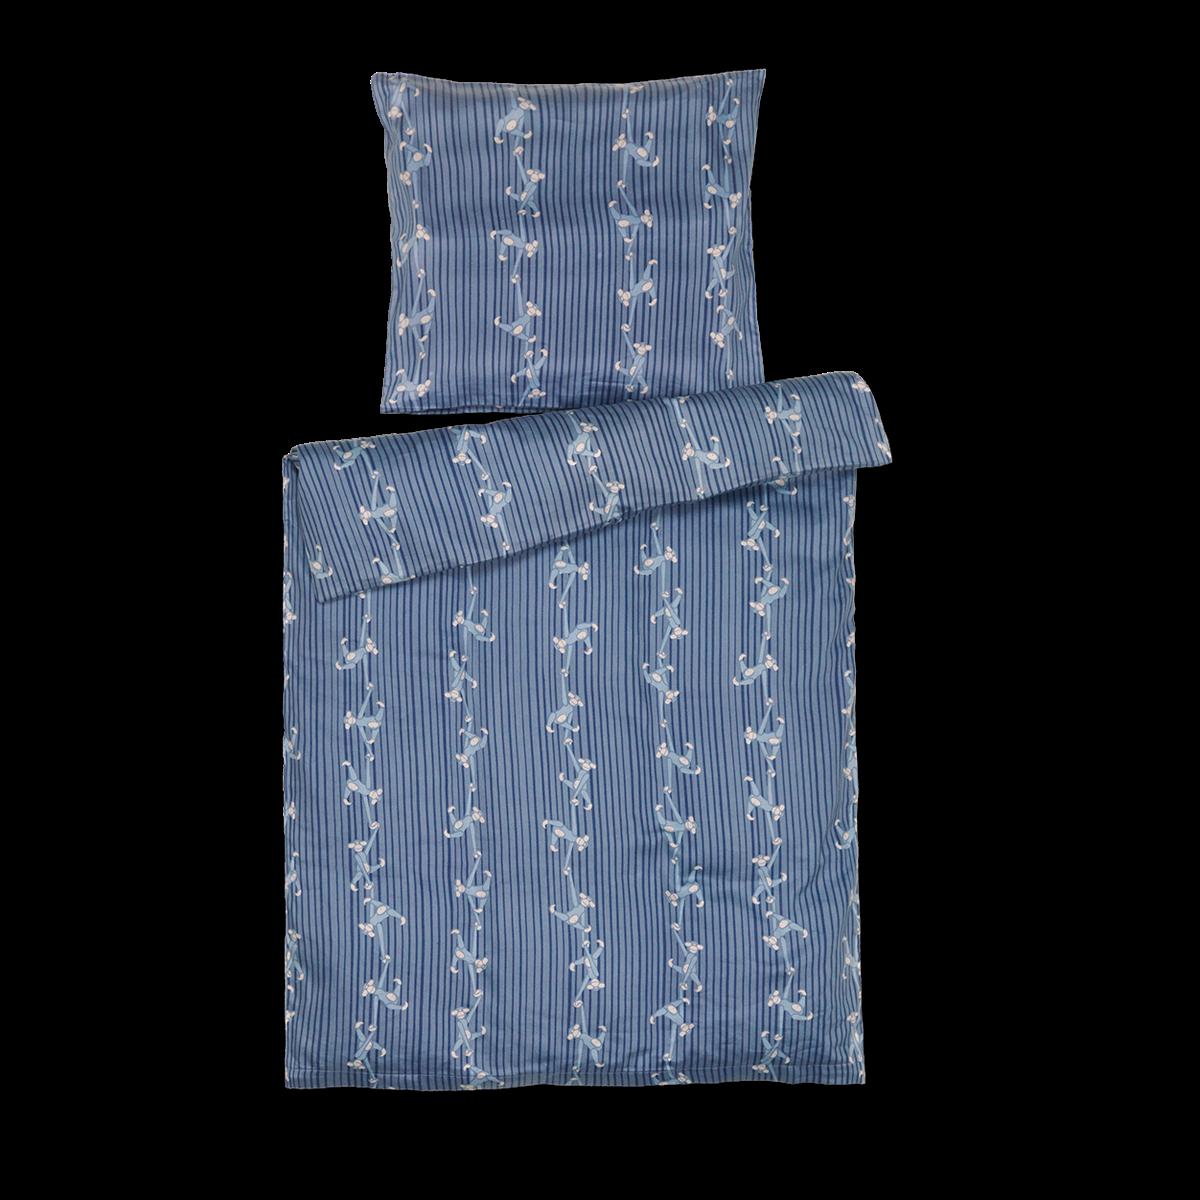 Kay Bojesen - Abe Junior Bedding 100 x 140 cm - Blue (39391)